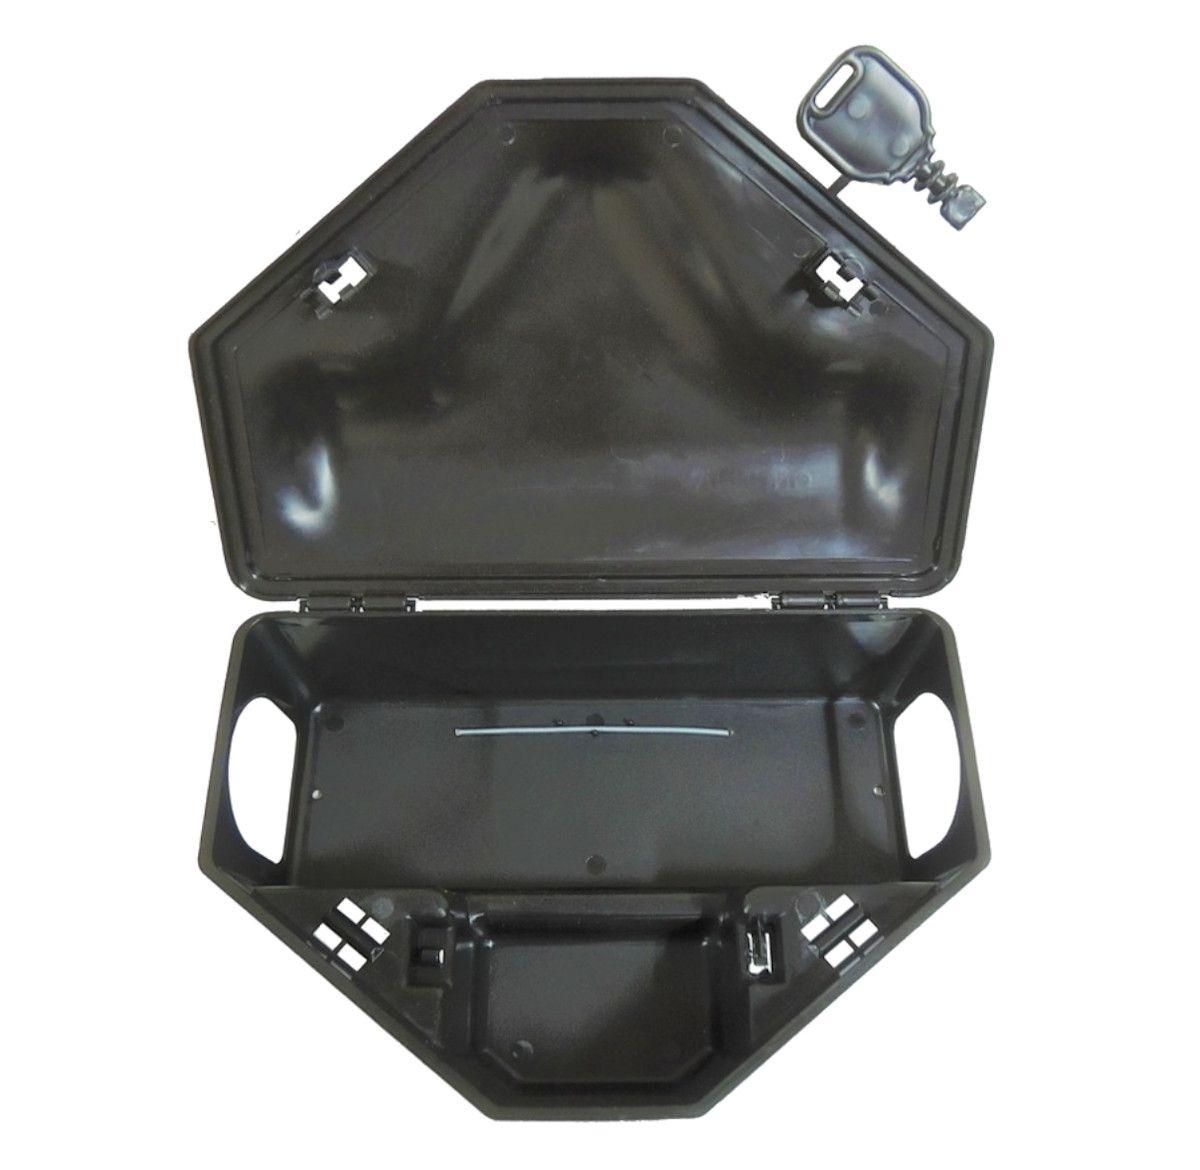 KIT 65 Porta Iscas Resistentes 2 TRAVAS c/ Chave Mata Ratos